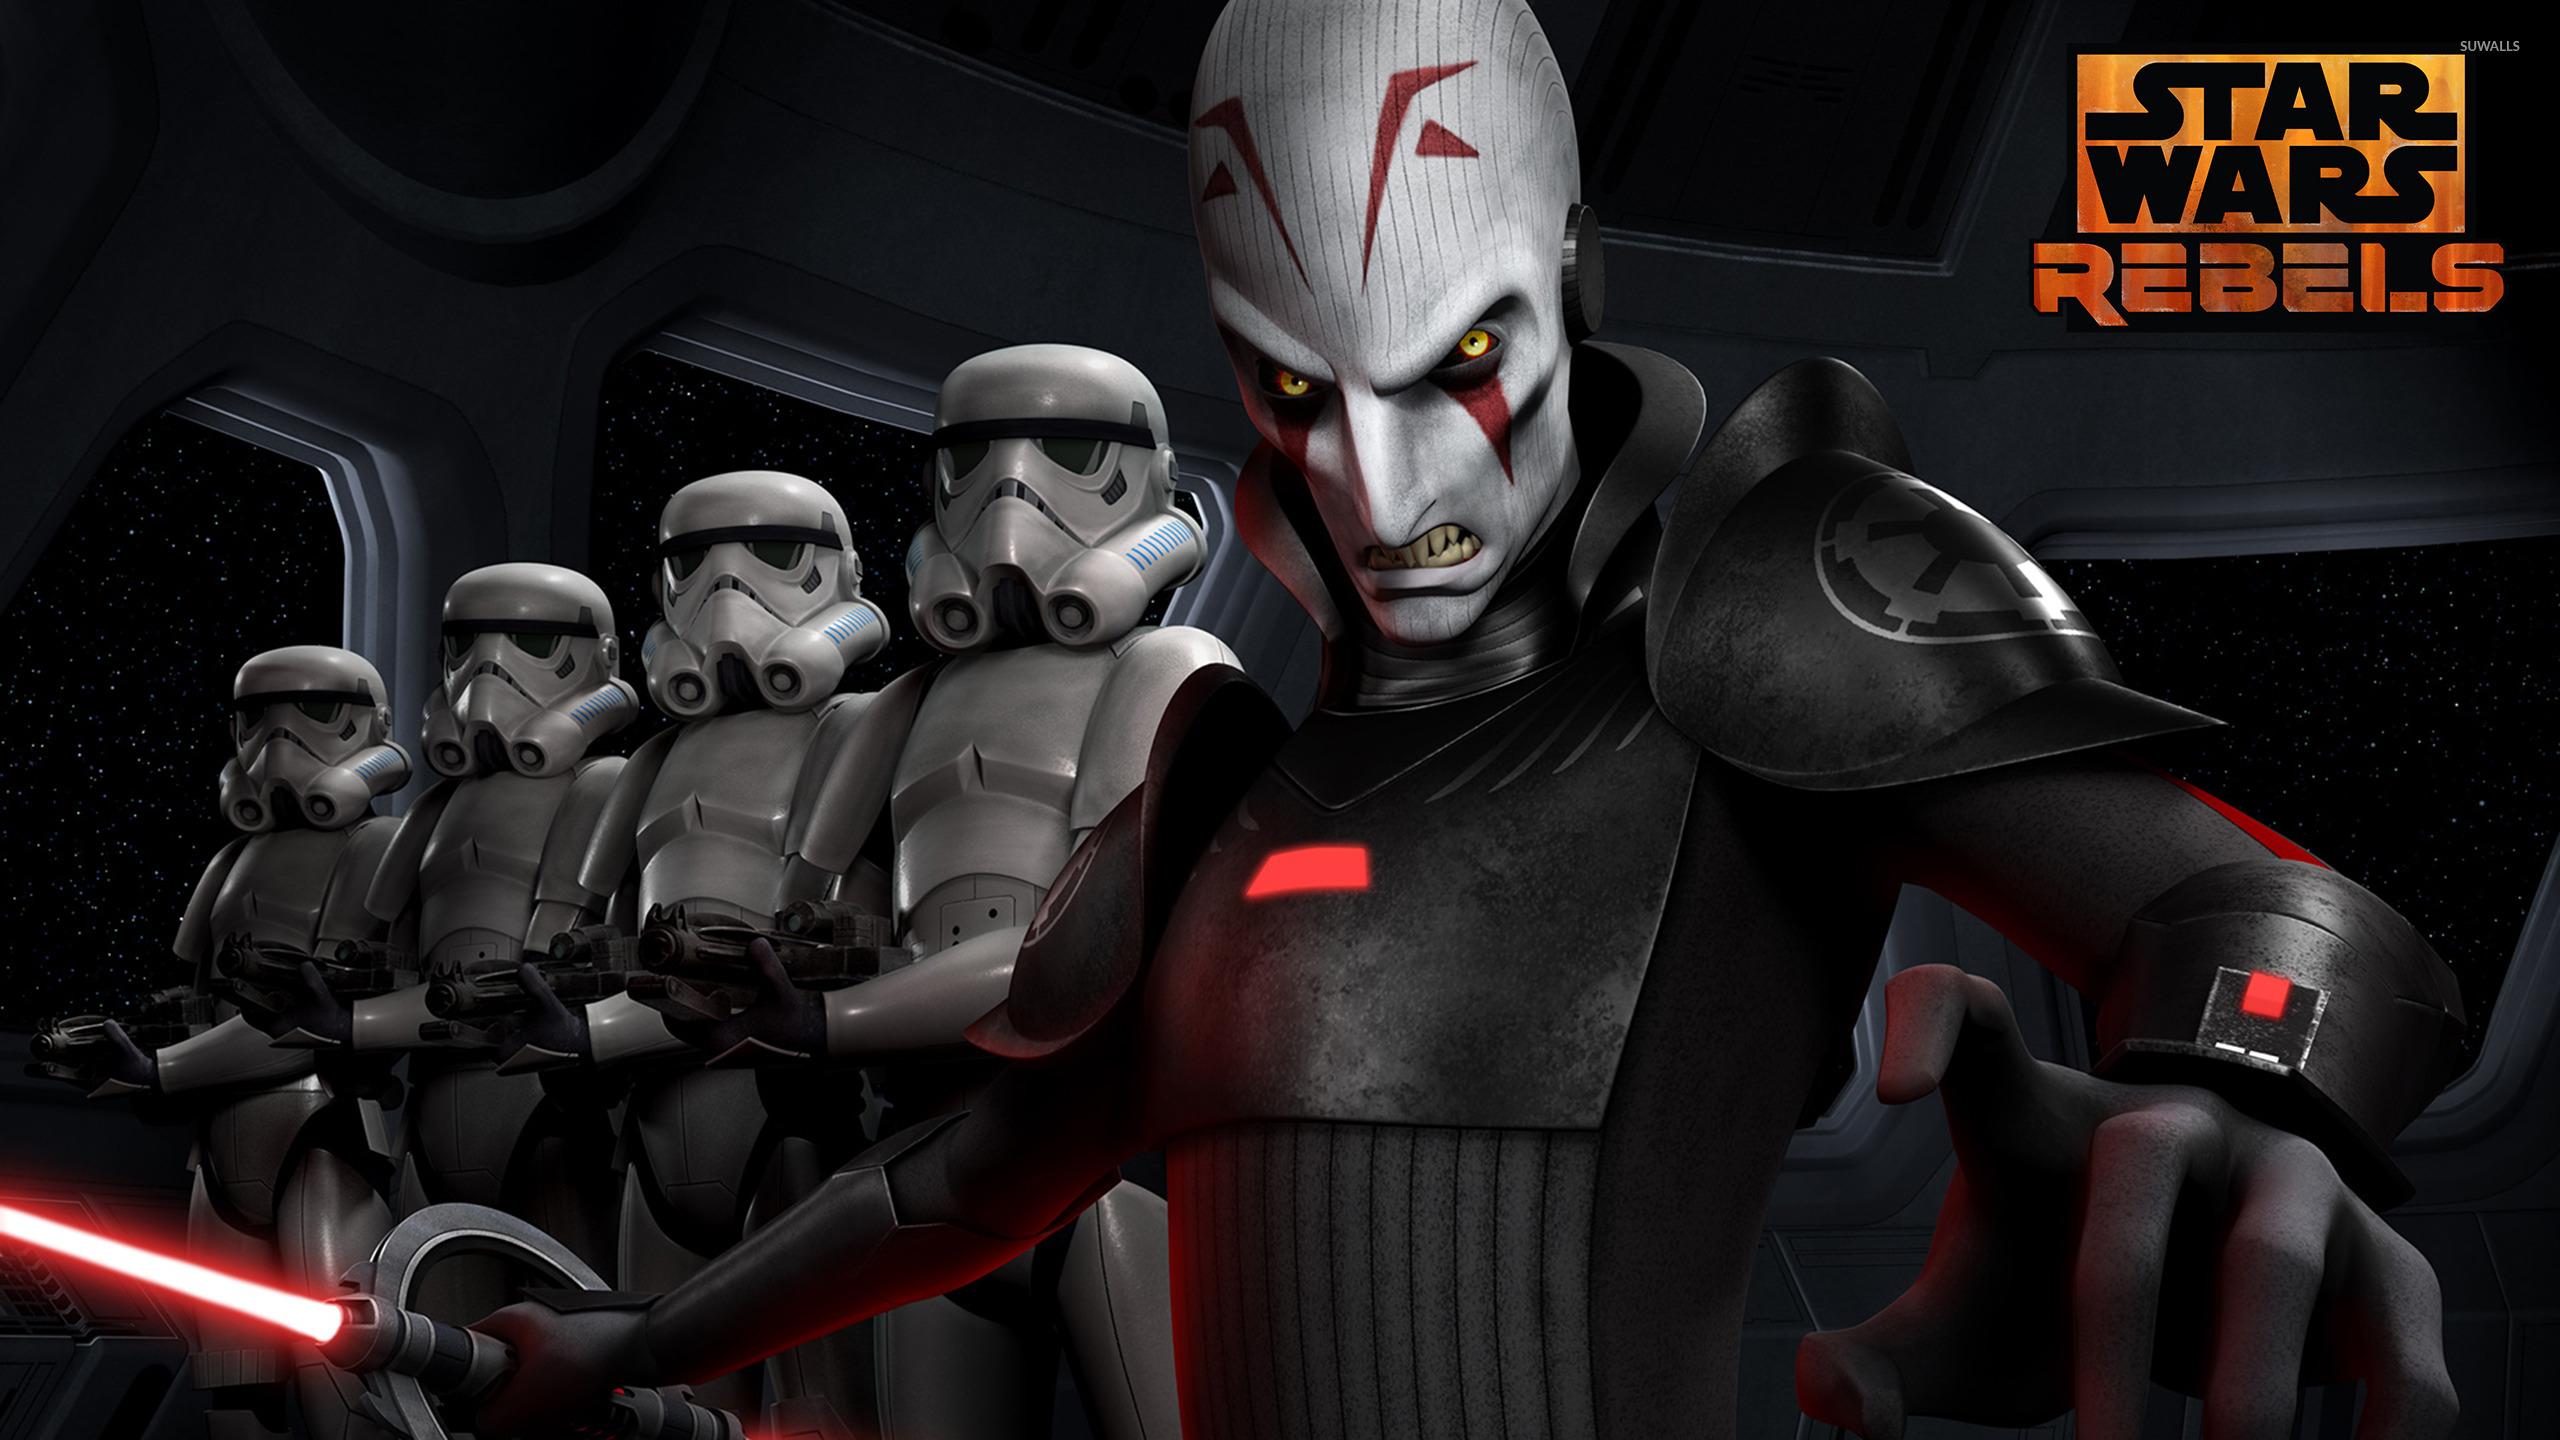 Kanan Star Wars Rebels Wallpaper Cartoon Wallpapers 31791